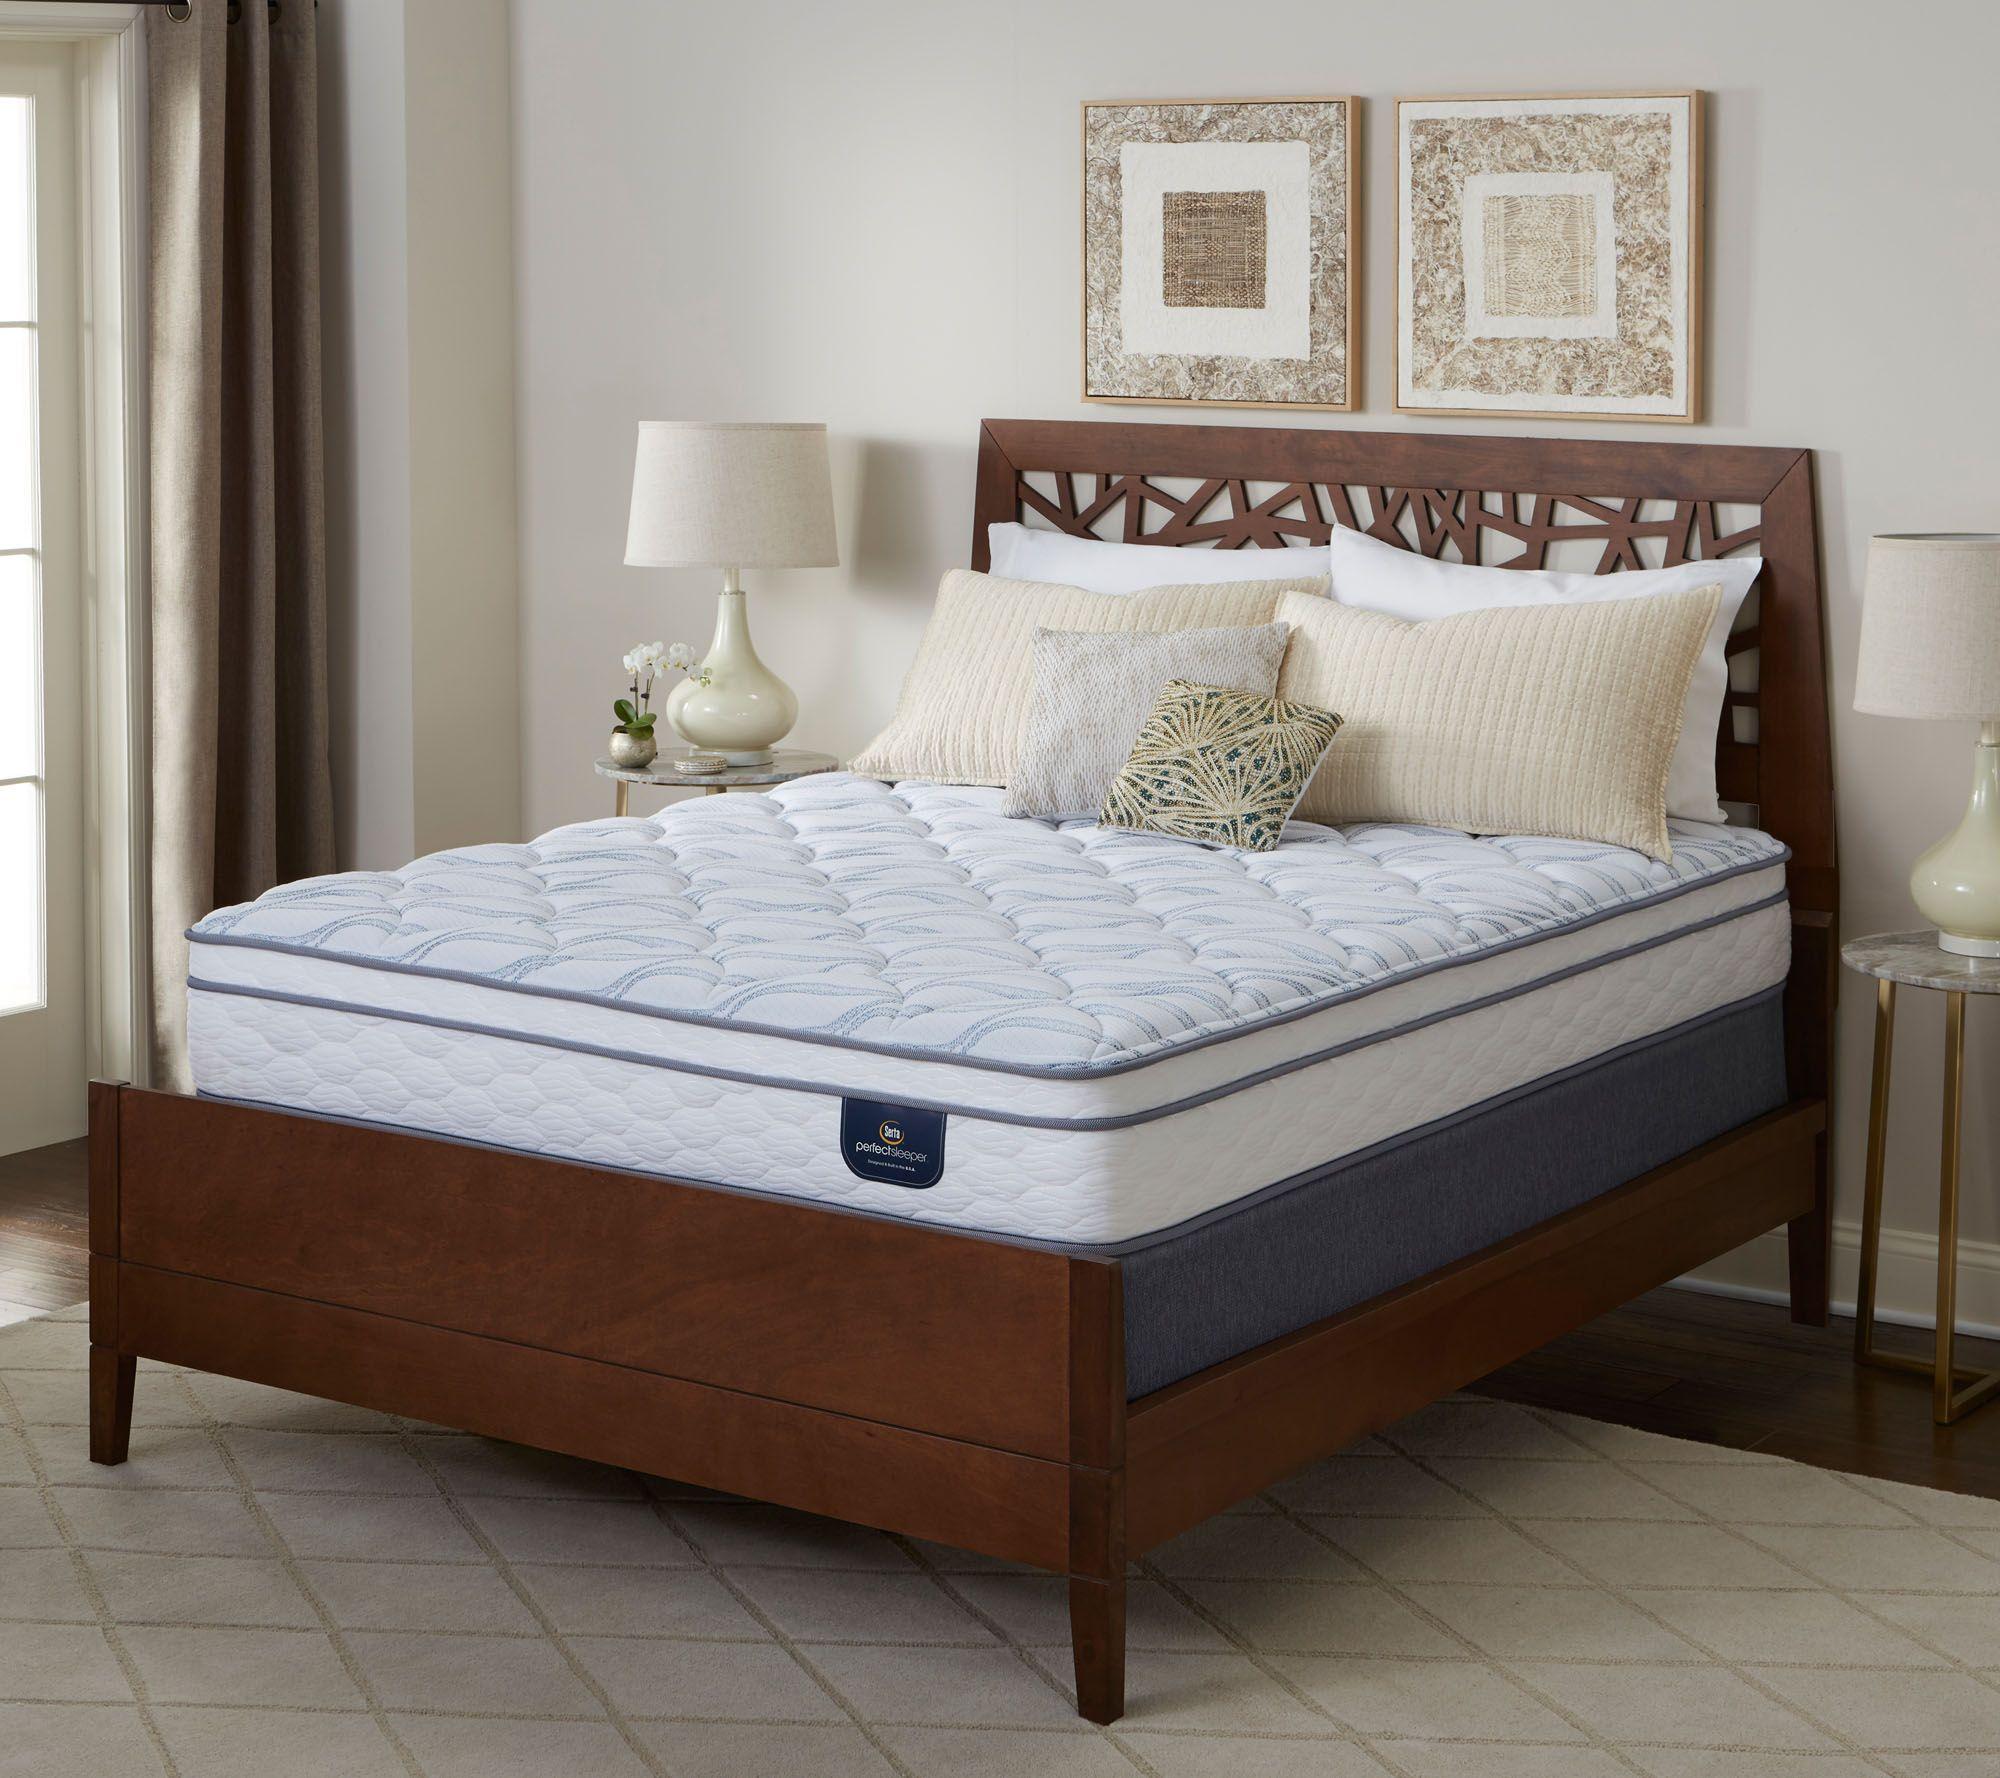 Serta Perfect Sleeper Carmine Euro Top Twin Mattress Set   H291972